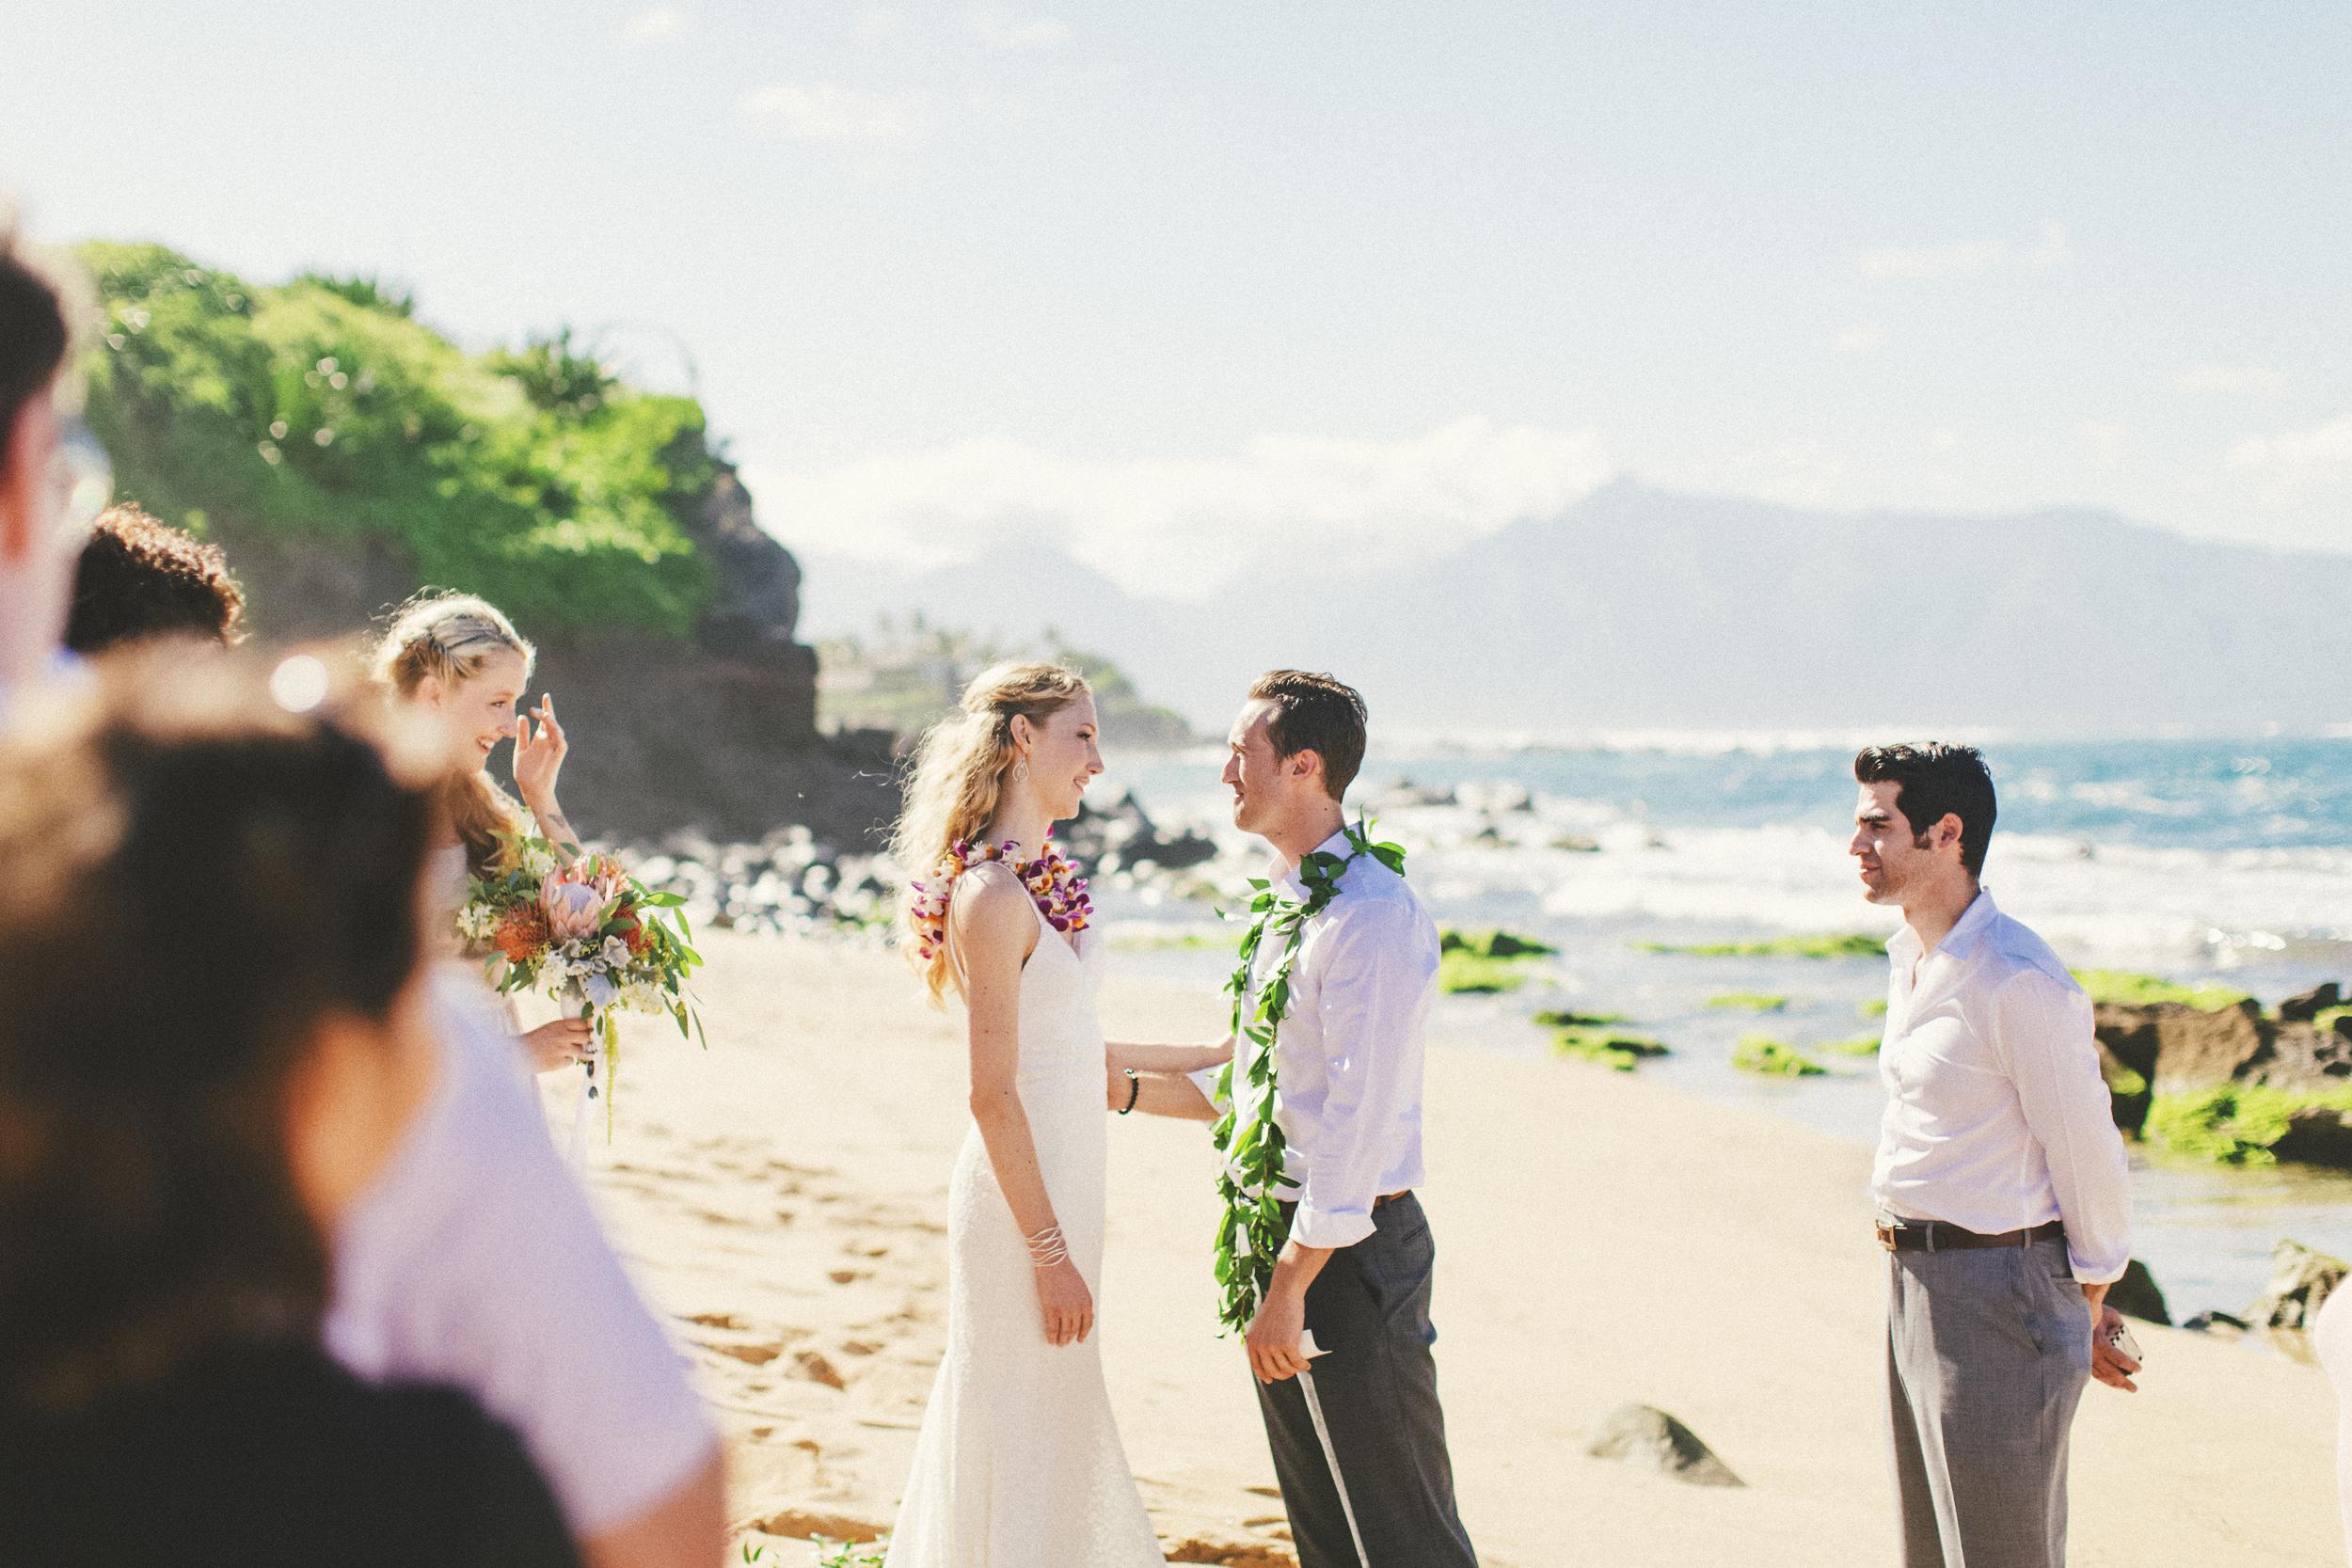 angie-diaz-photography-maui-wedding-57.jpg